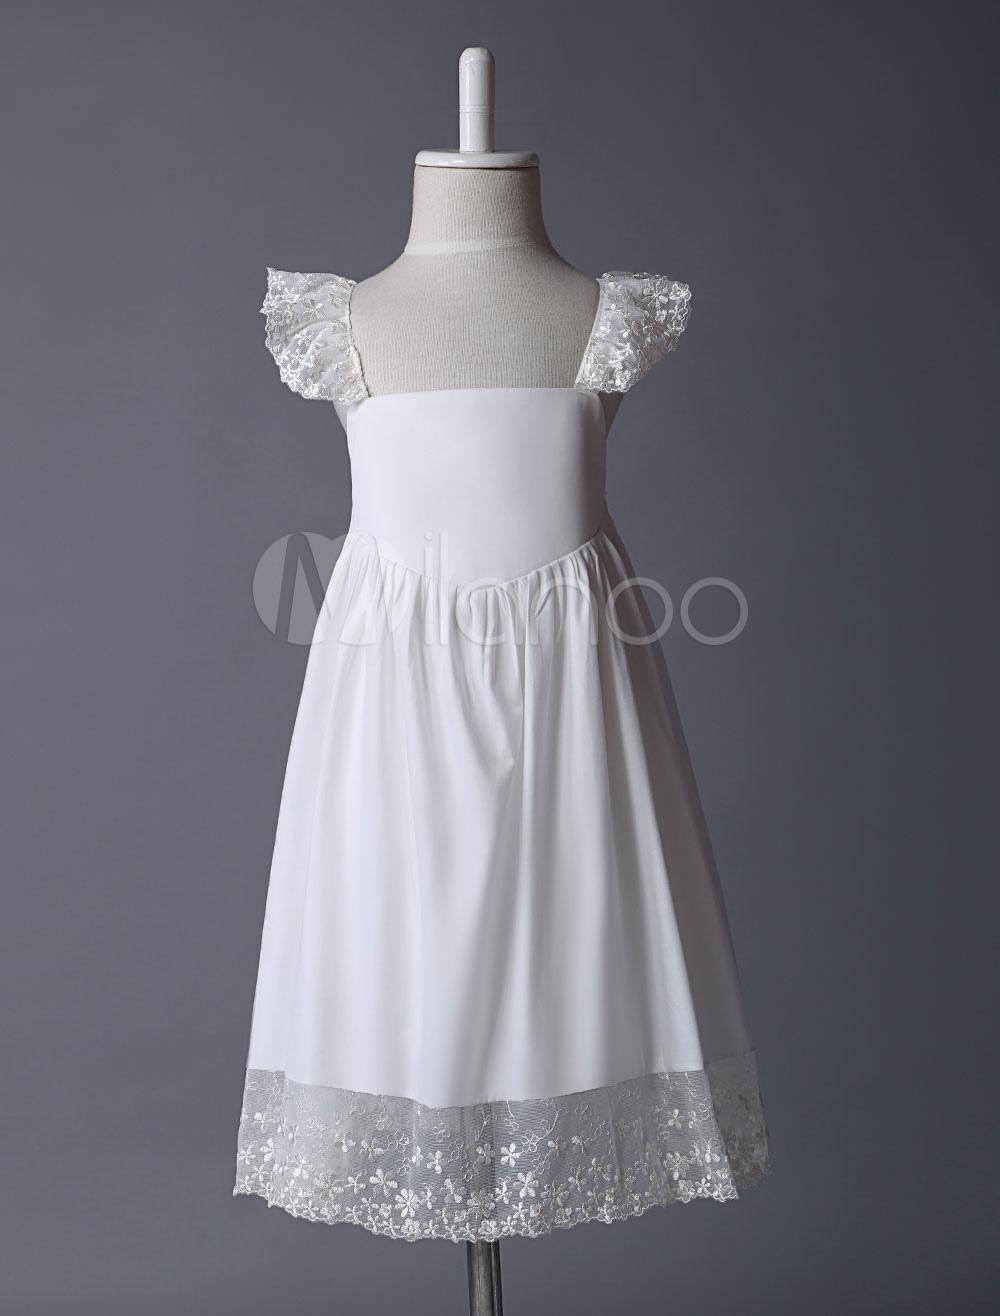 Ivory Flower Girl Dress Boho Summer Beach Lace Trim Little Girls Dresses